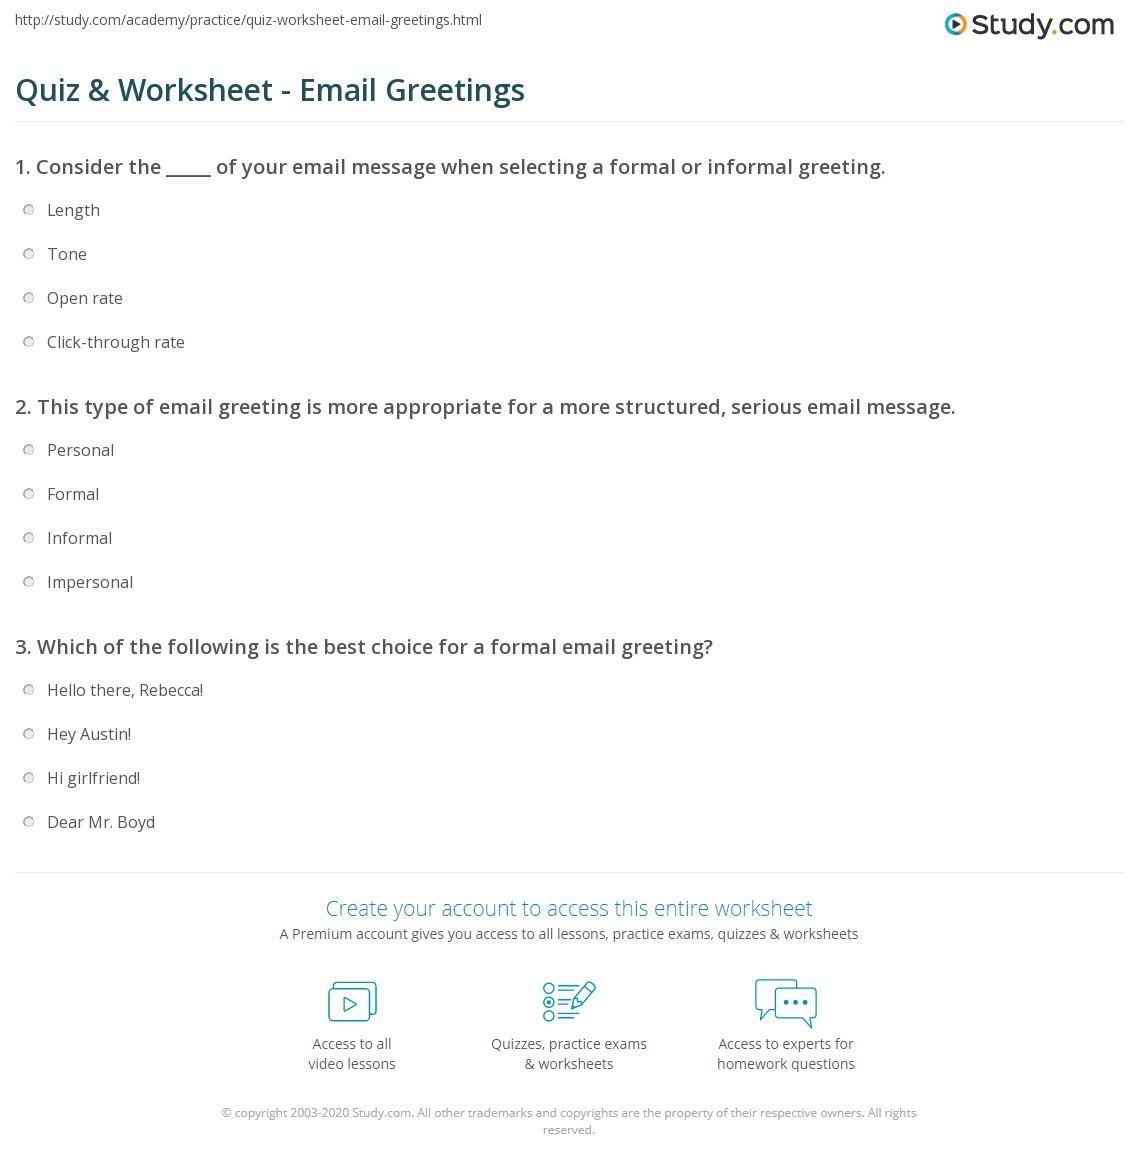 Quiz & Worksheet - Email Greetings   Study.com